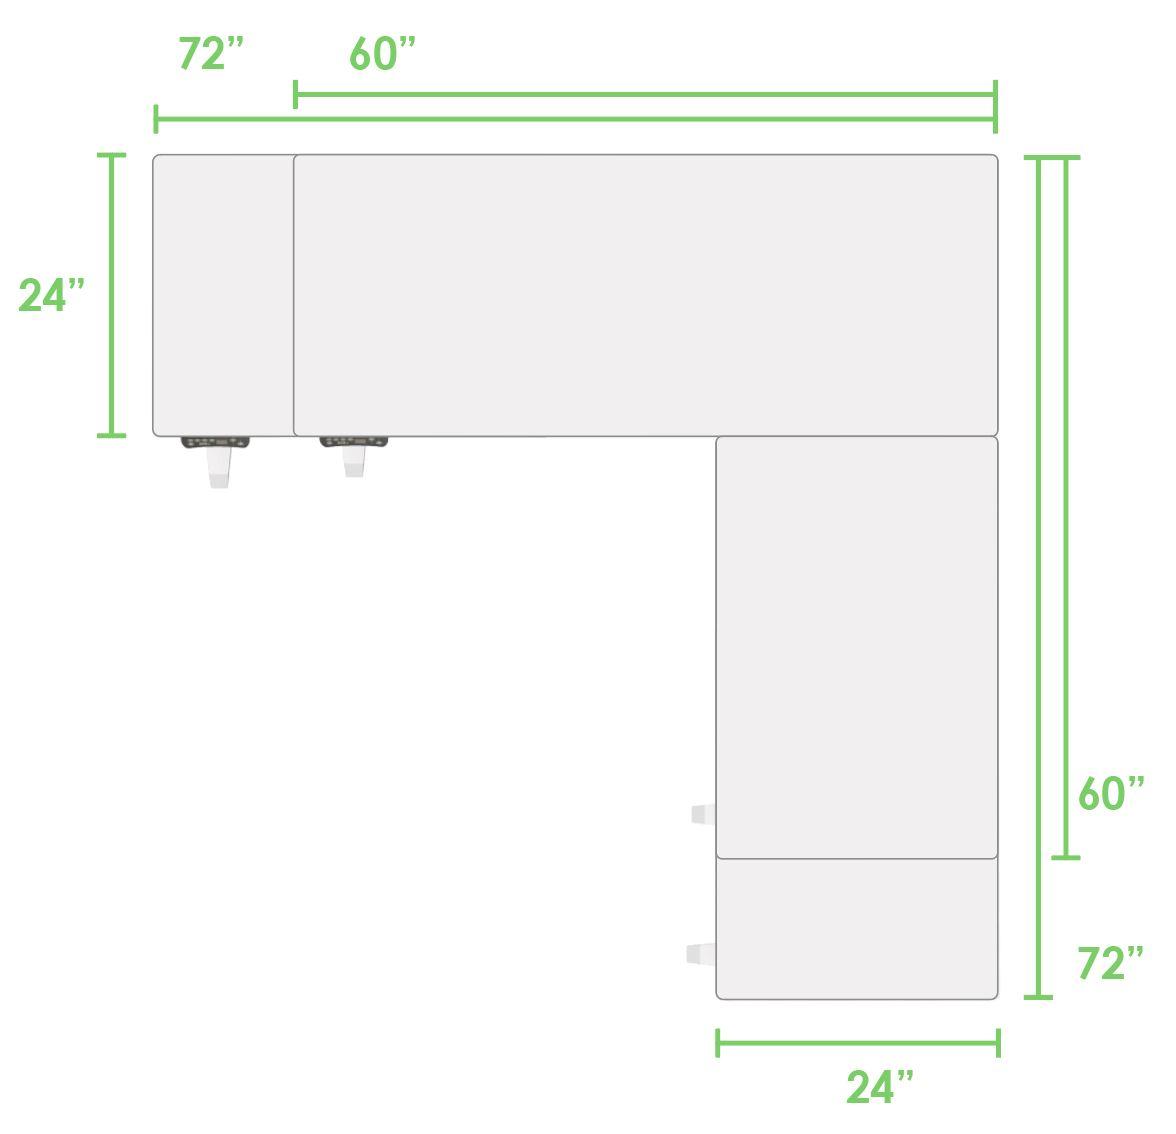 ldesk-dimensions.jpg